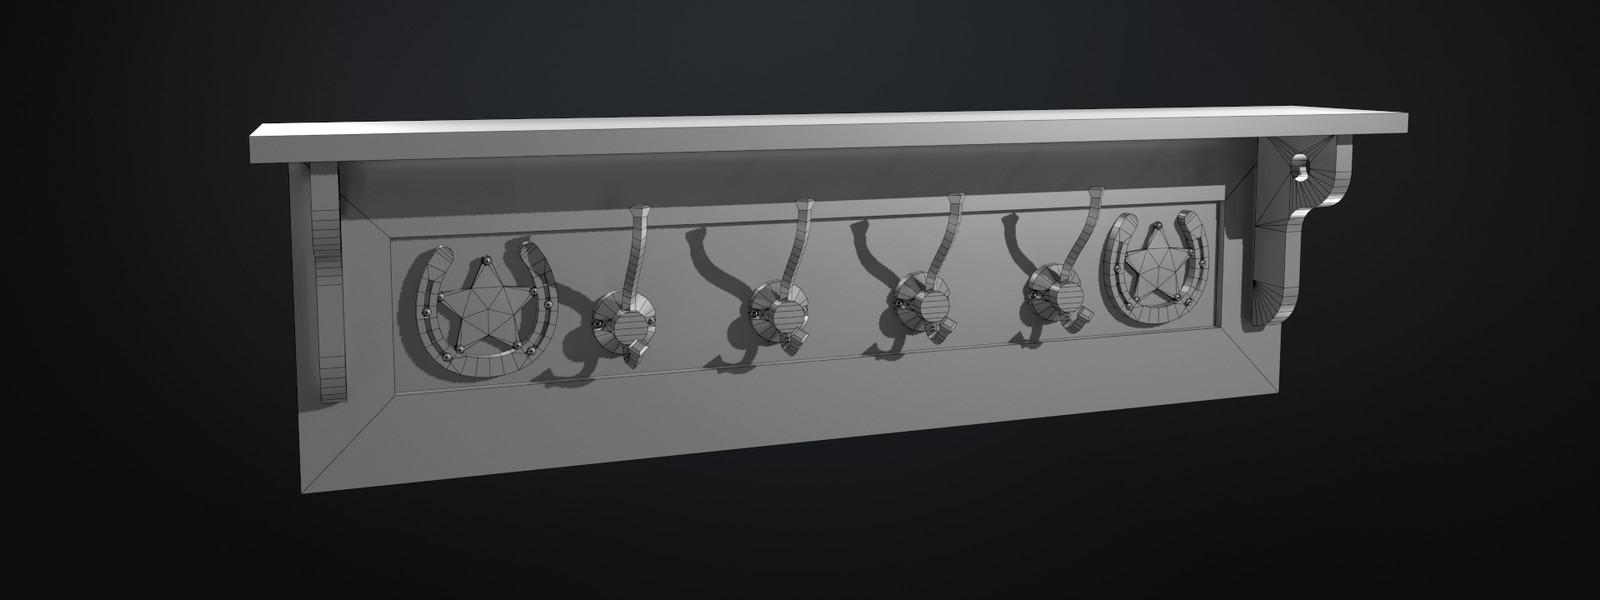 Marmoset render - Wireframe